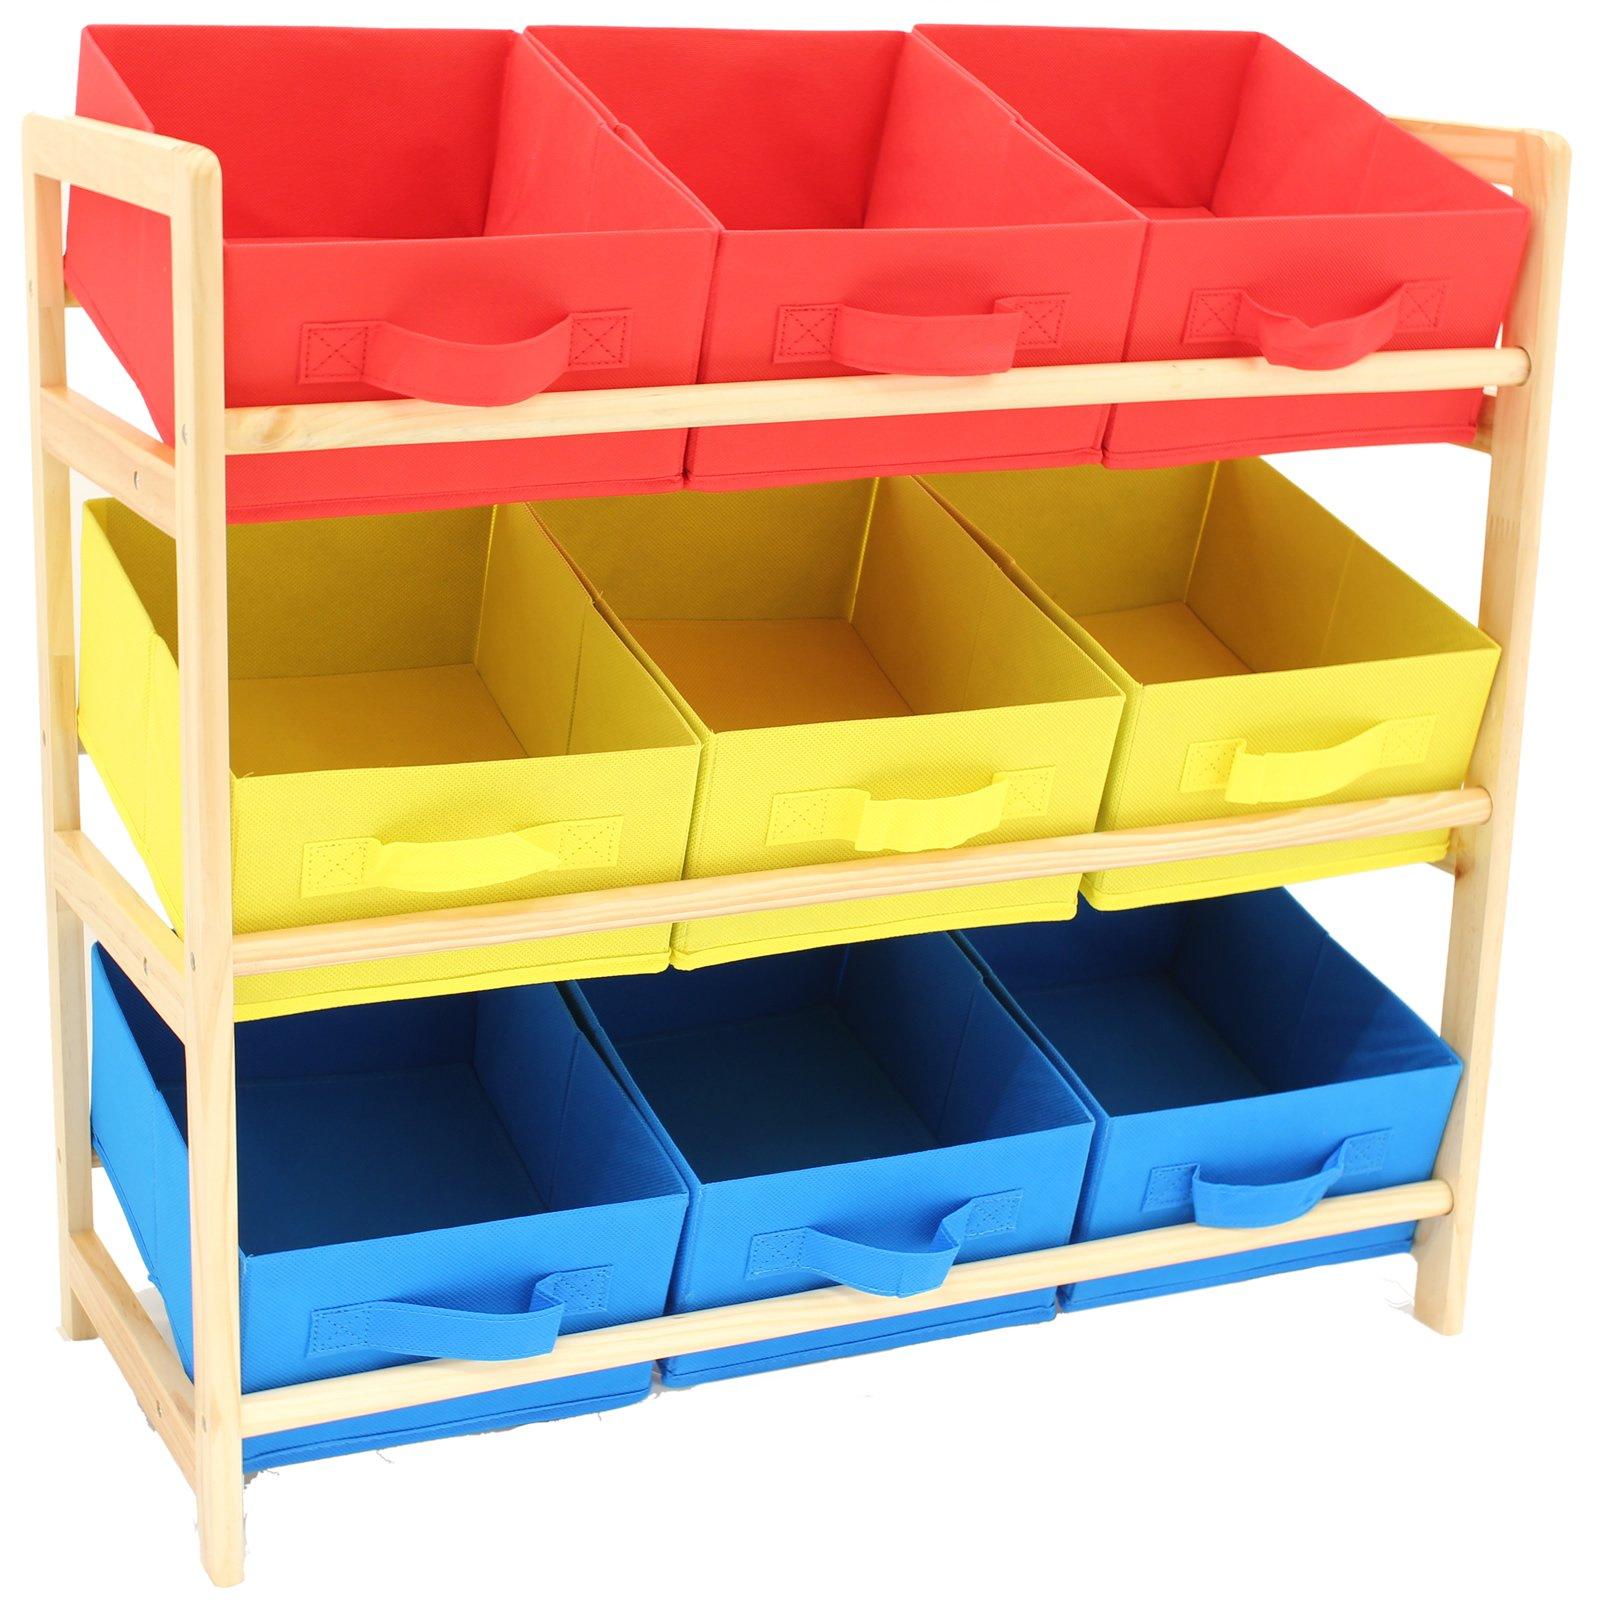 Hartleys 3 Tier Storage Unit with 9 Canvas Bins - Yellow Blue u0026 Red  sc 1 st  Amazon UK & Childrenu0027s Bedroom Storage: Amazon.co.uk